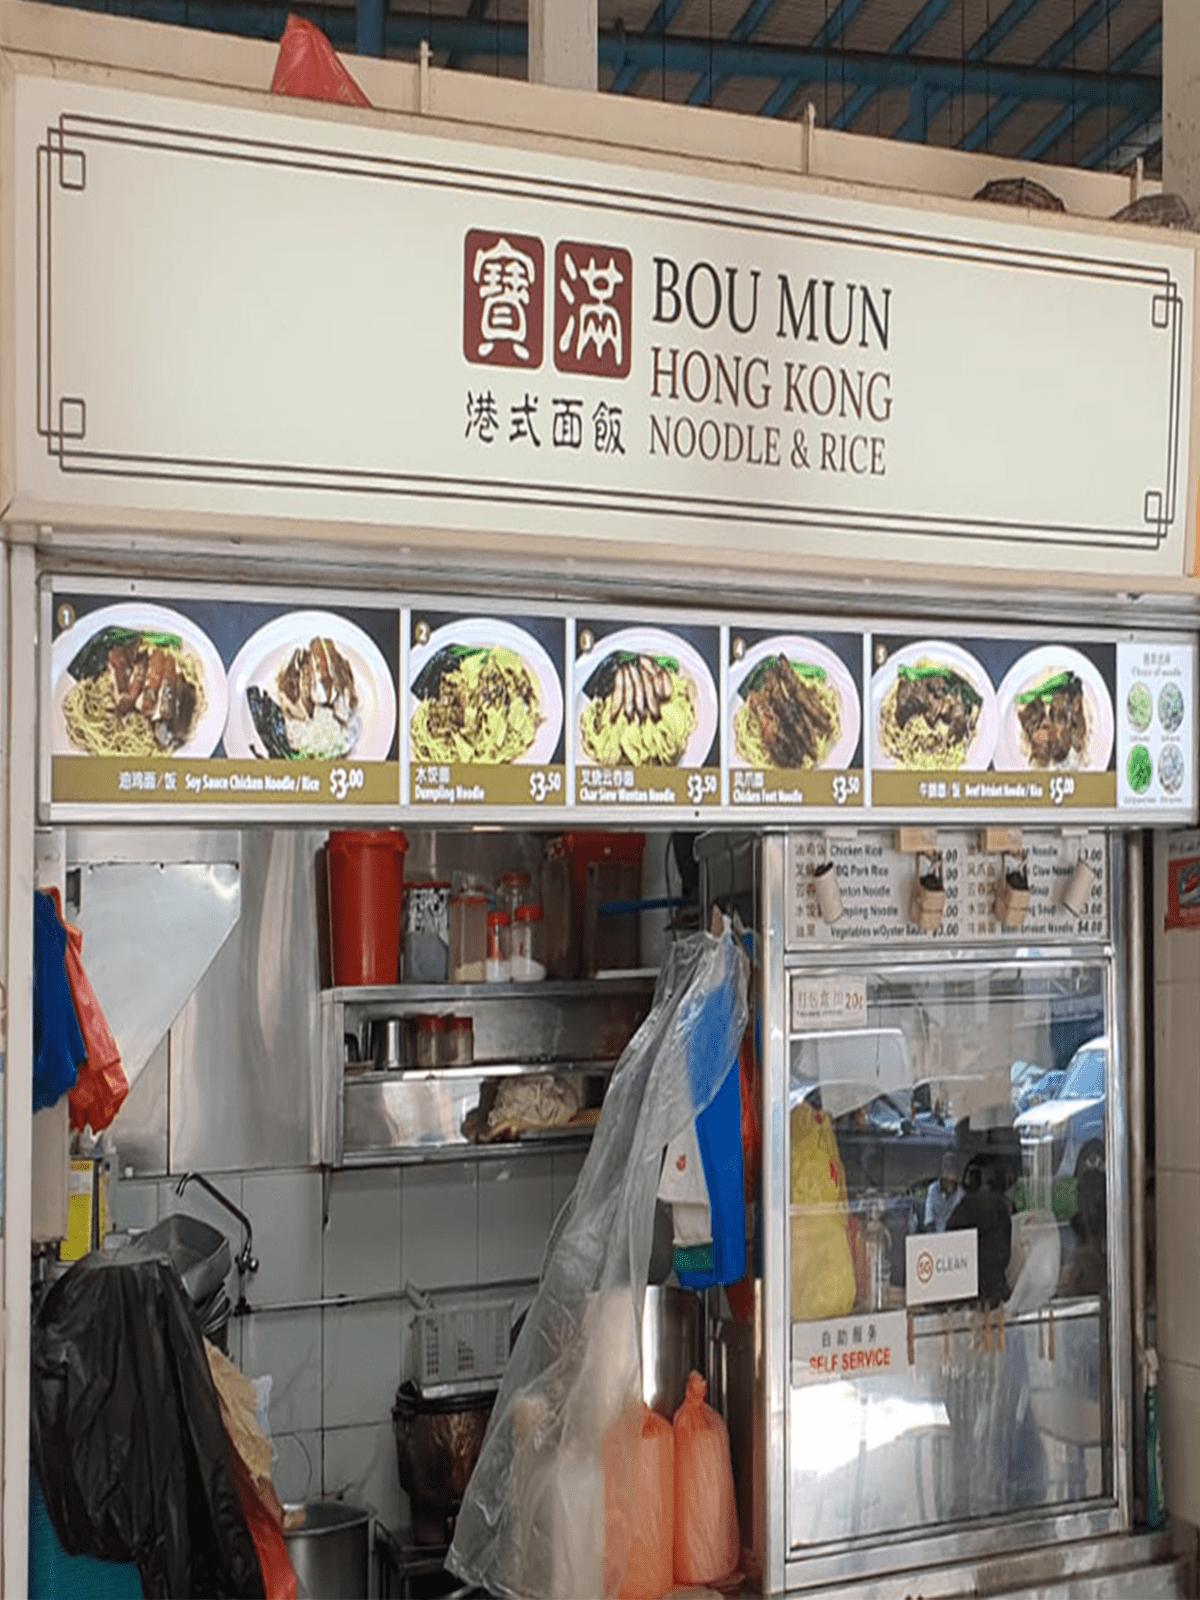 bon mun hong kong noodle & rice